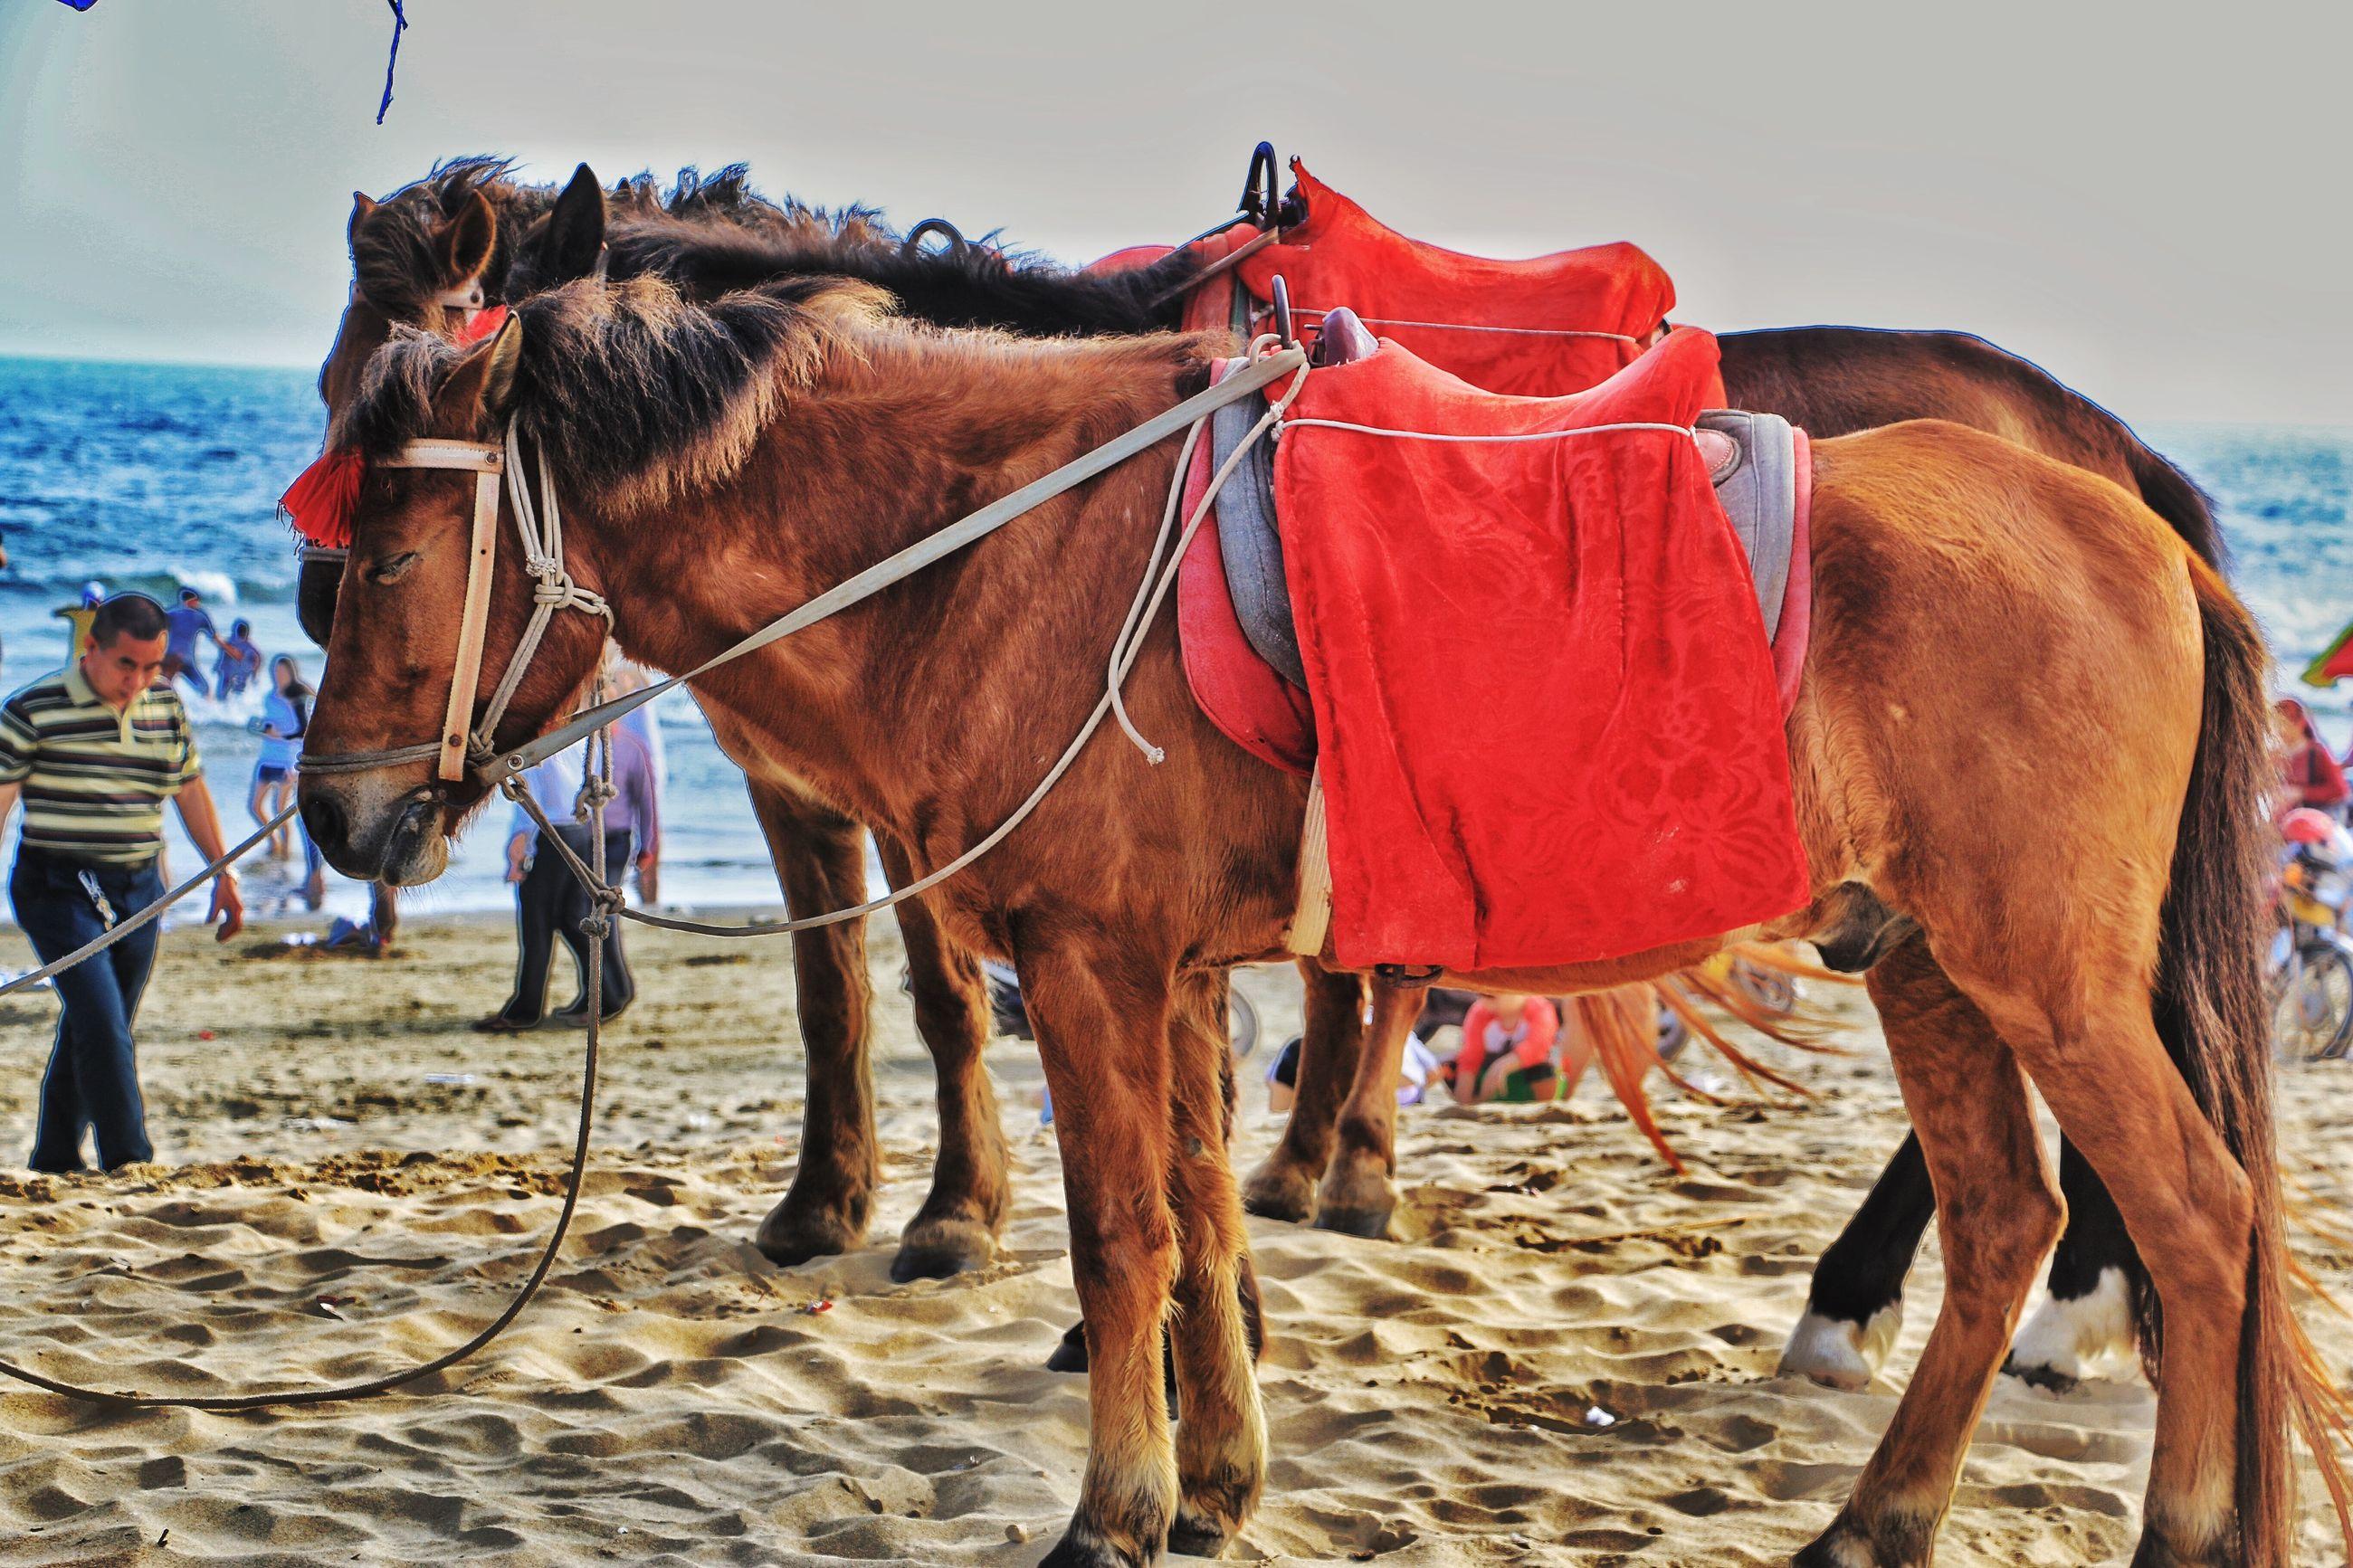 animal themes, domestic animals, horse, working animal, mammal, beach, sand, livestock, sea, one animal, camel, standing, men, full length, lifestyles, sky, leisure activity, walking, herbivorous